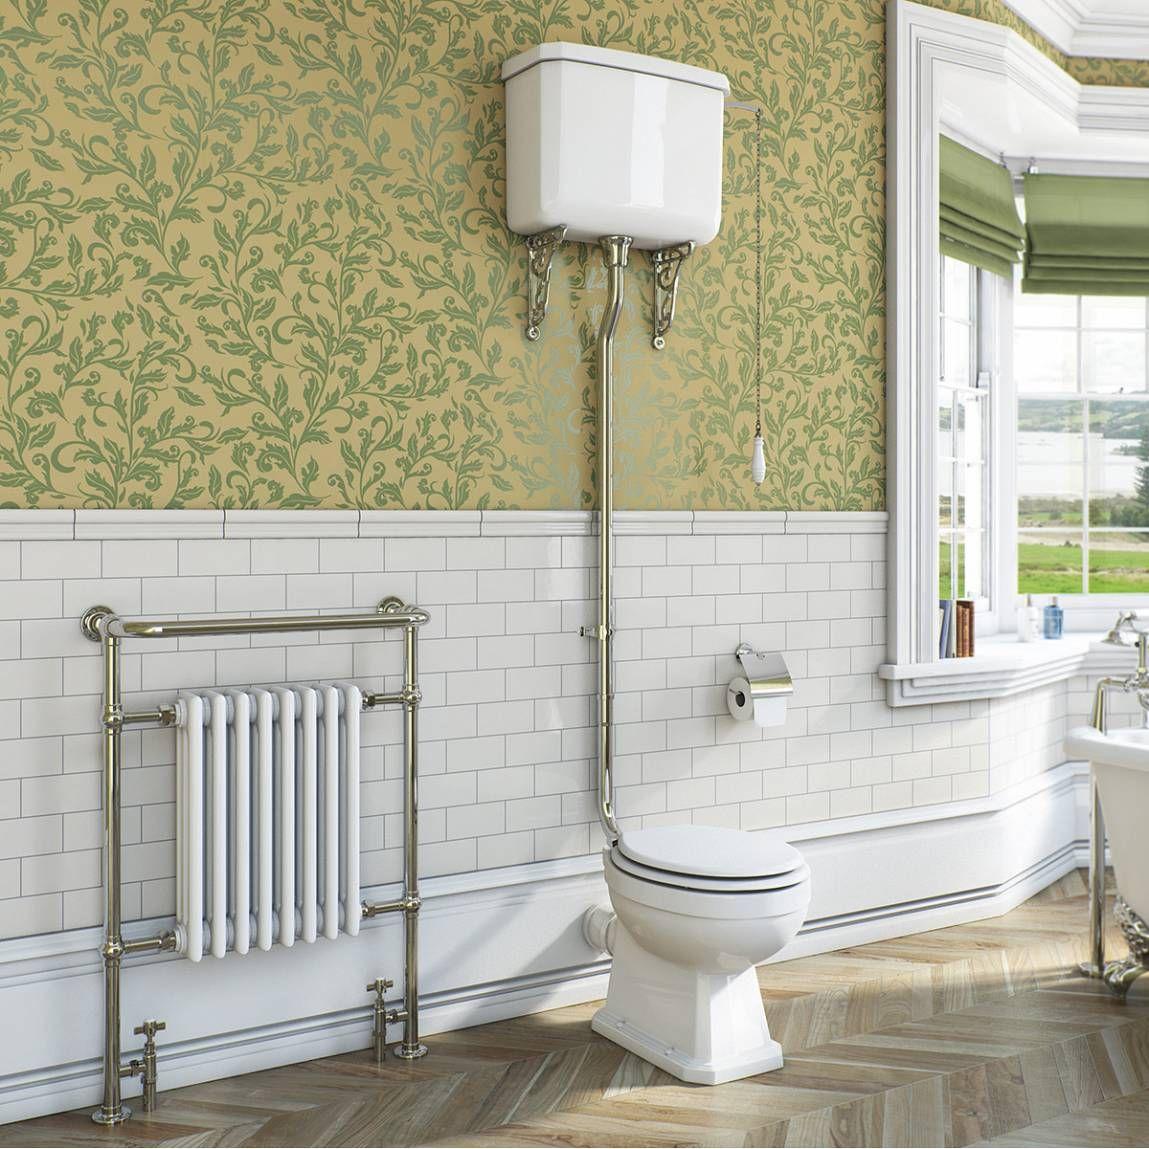 Regency High Level Toilet Inc Luxury White Mdf Seat Now 329 00 Toilet Bathroom Low Level Toilet